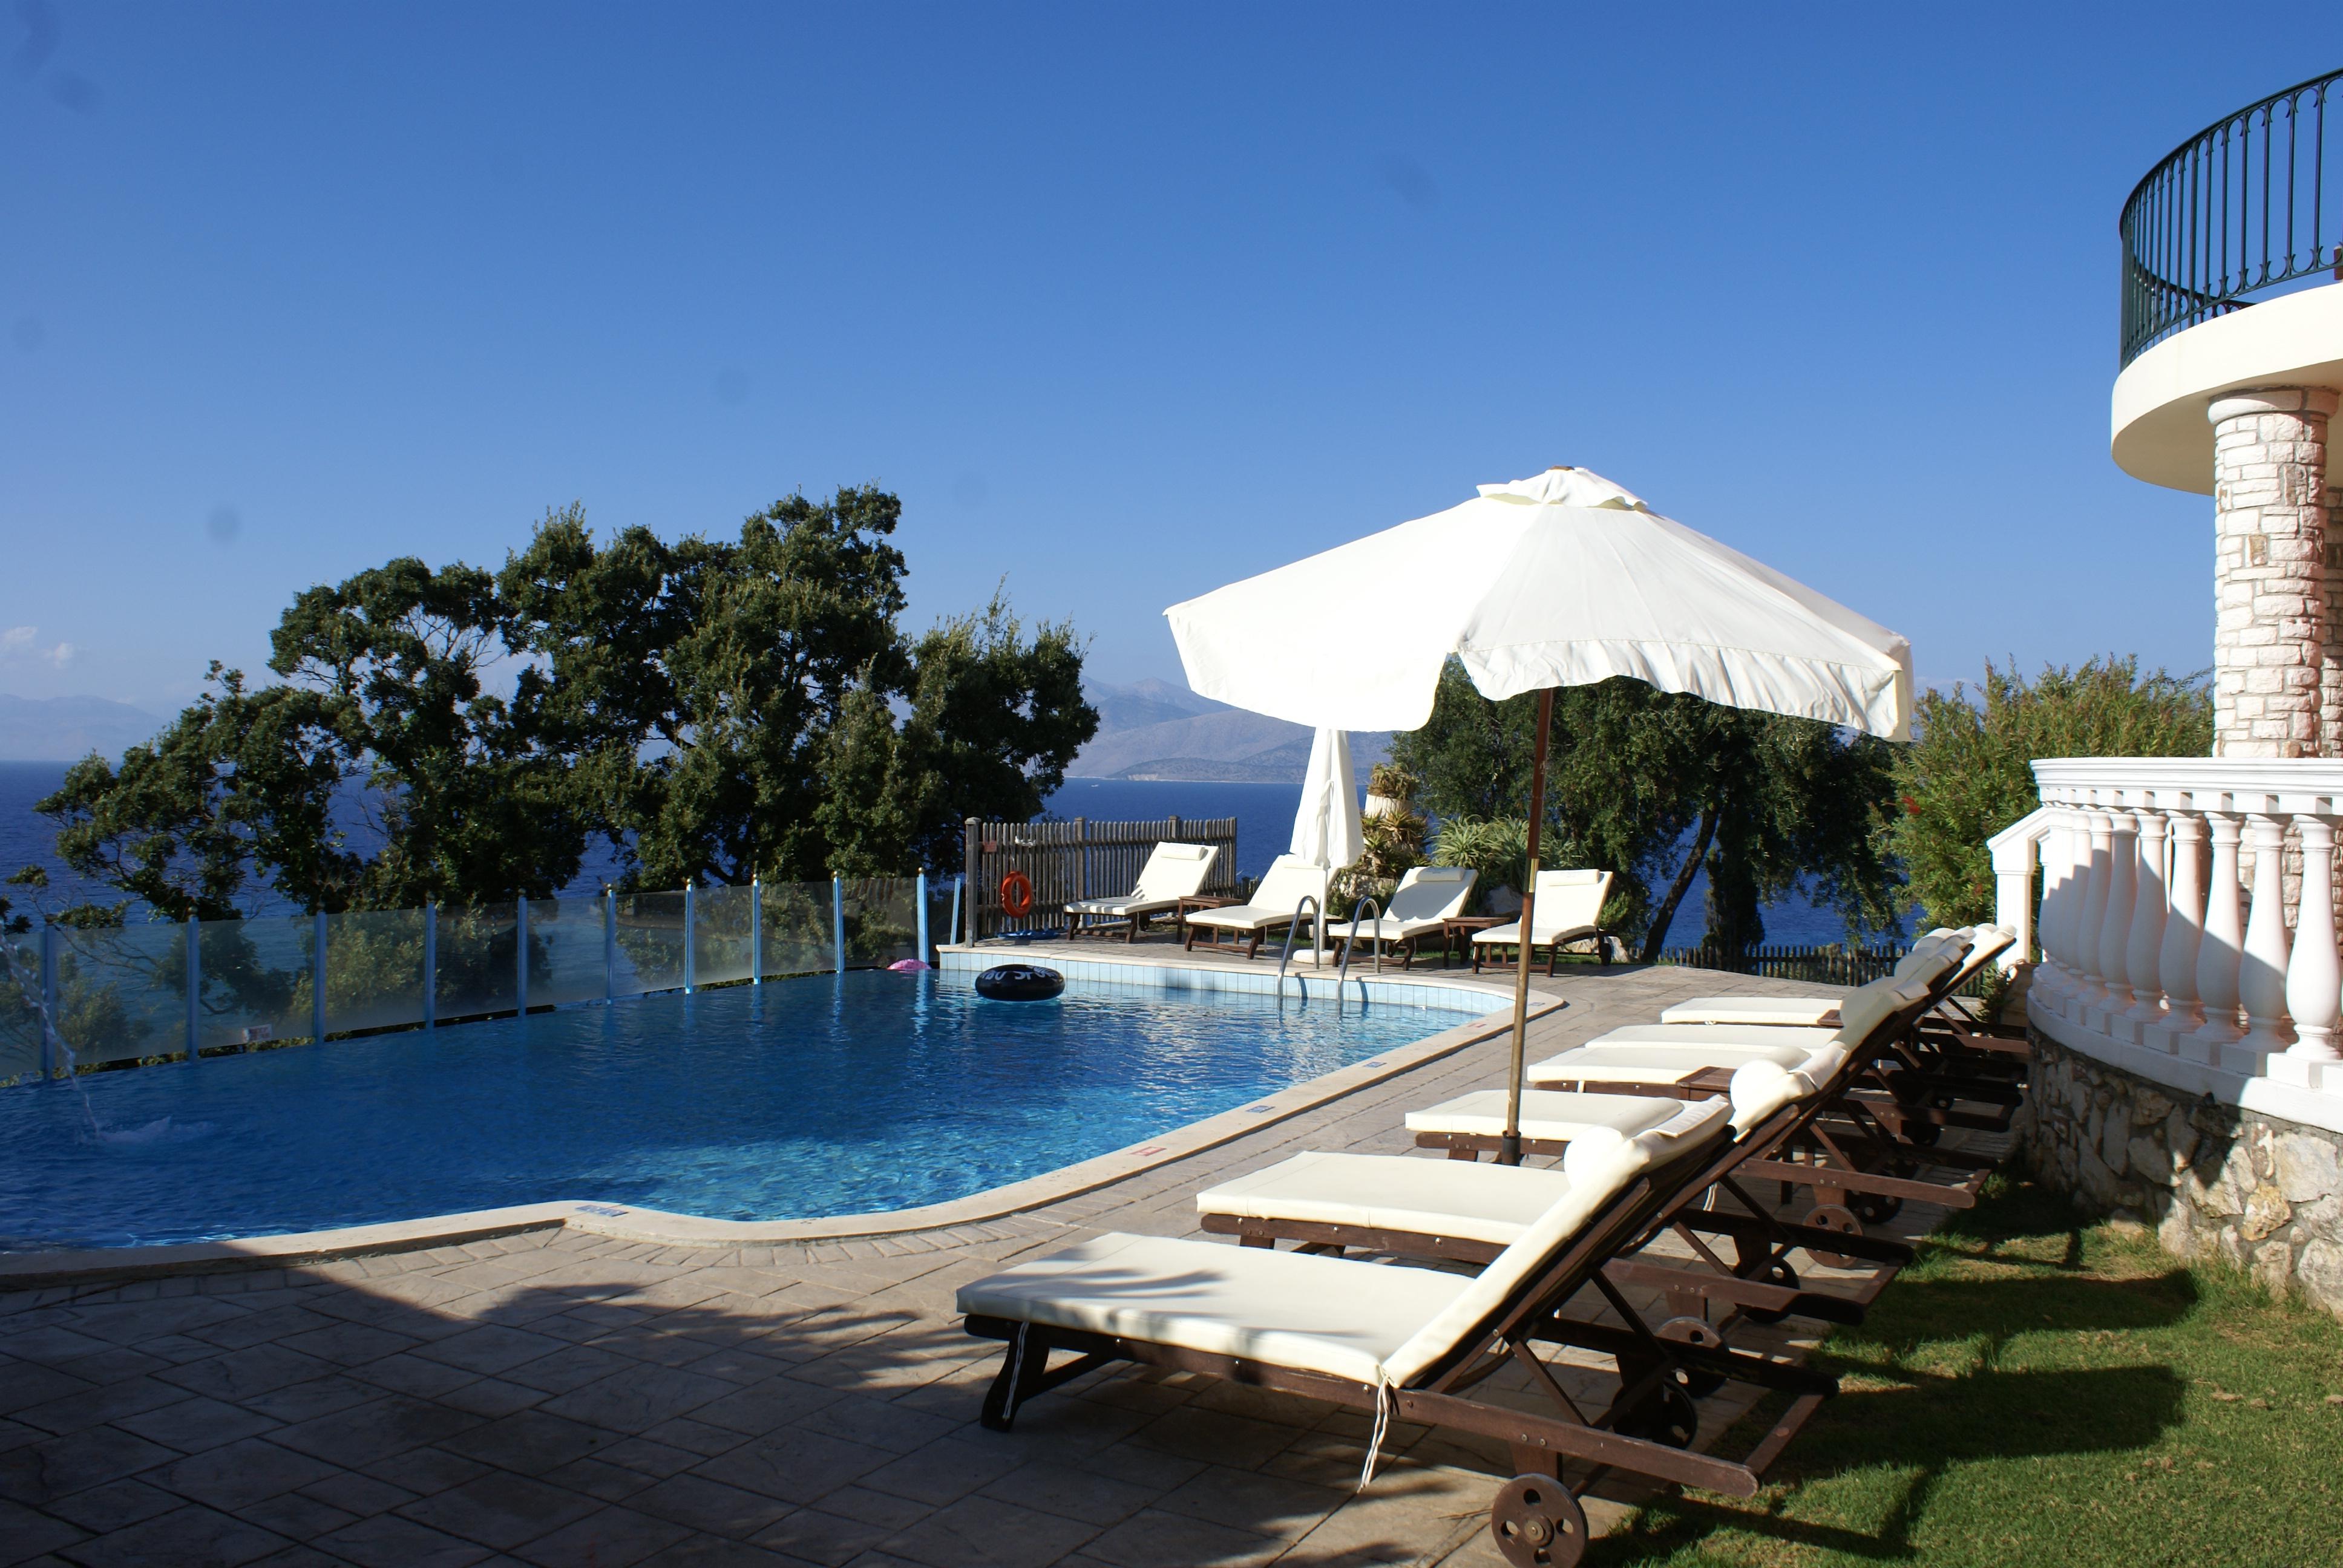 Pool - Korfu Villa Sankt Nikolas Strandhaus, Agios Spiridon, KorfuCorfu